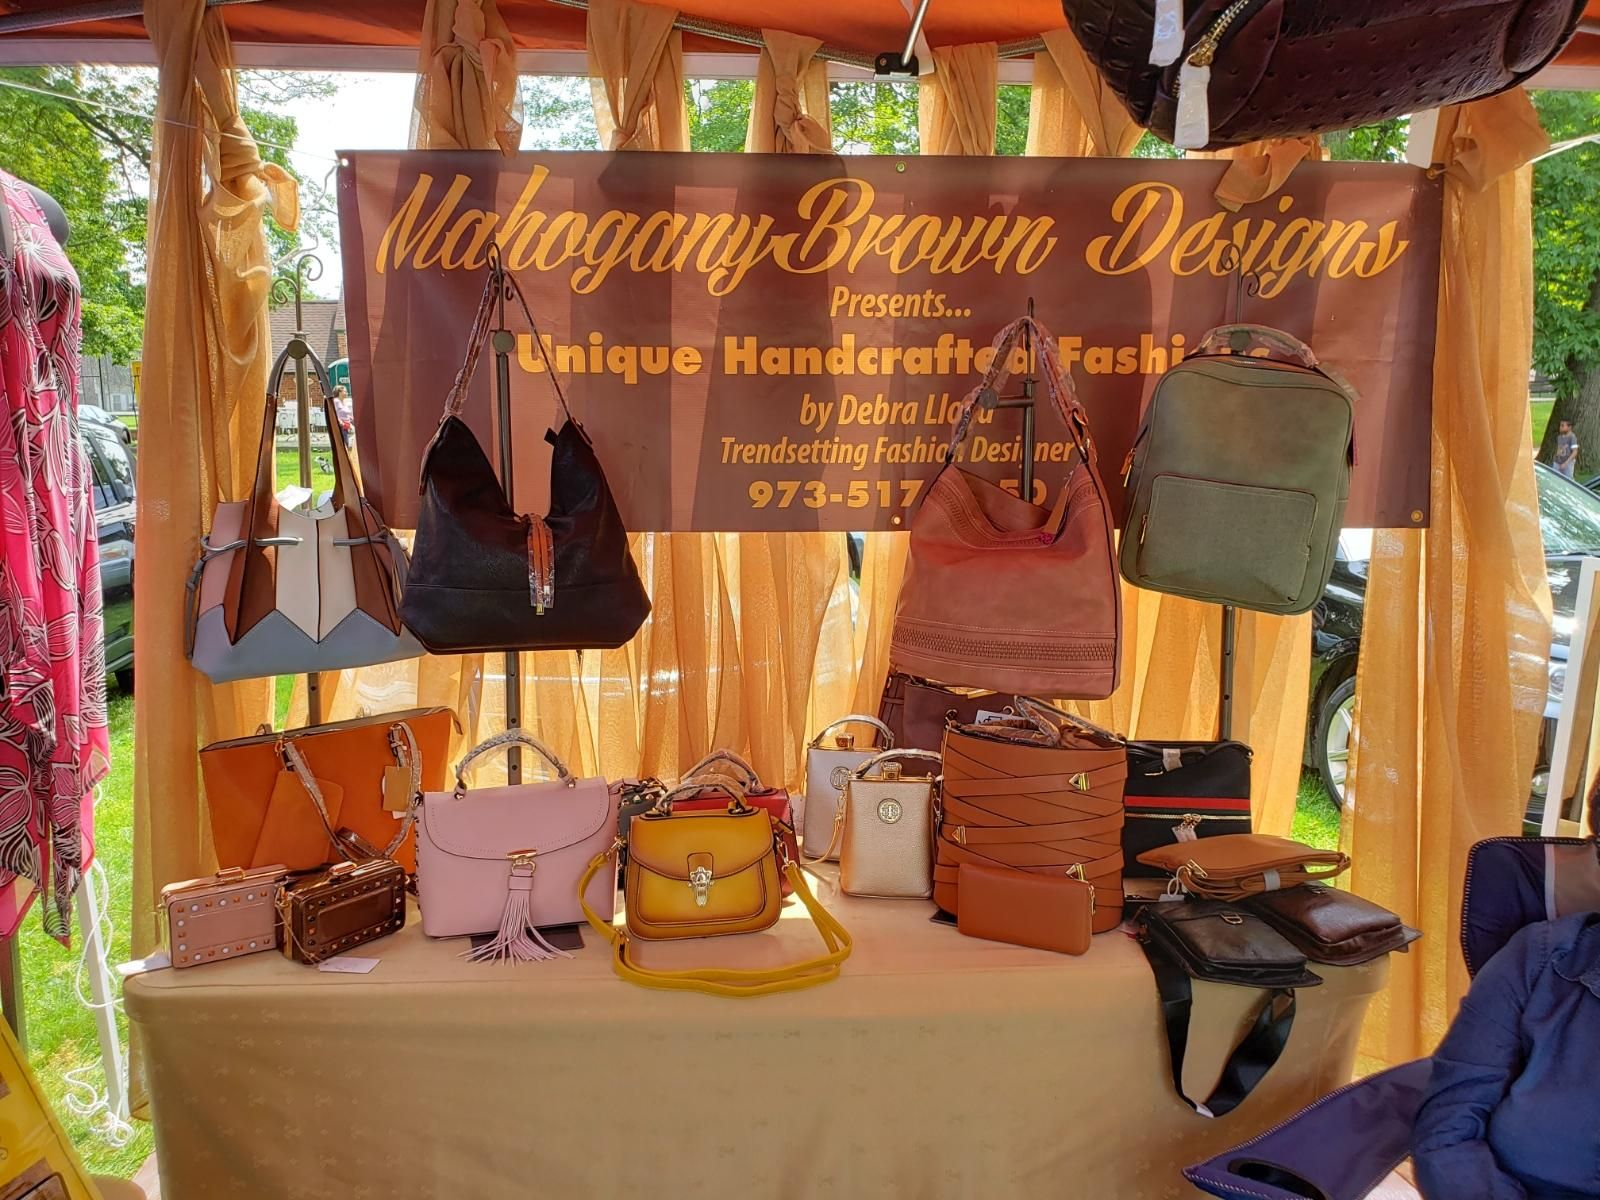 MahoganyBrown Designs